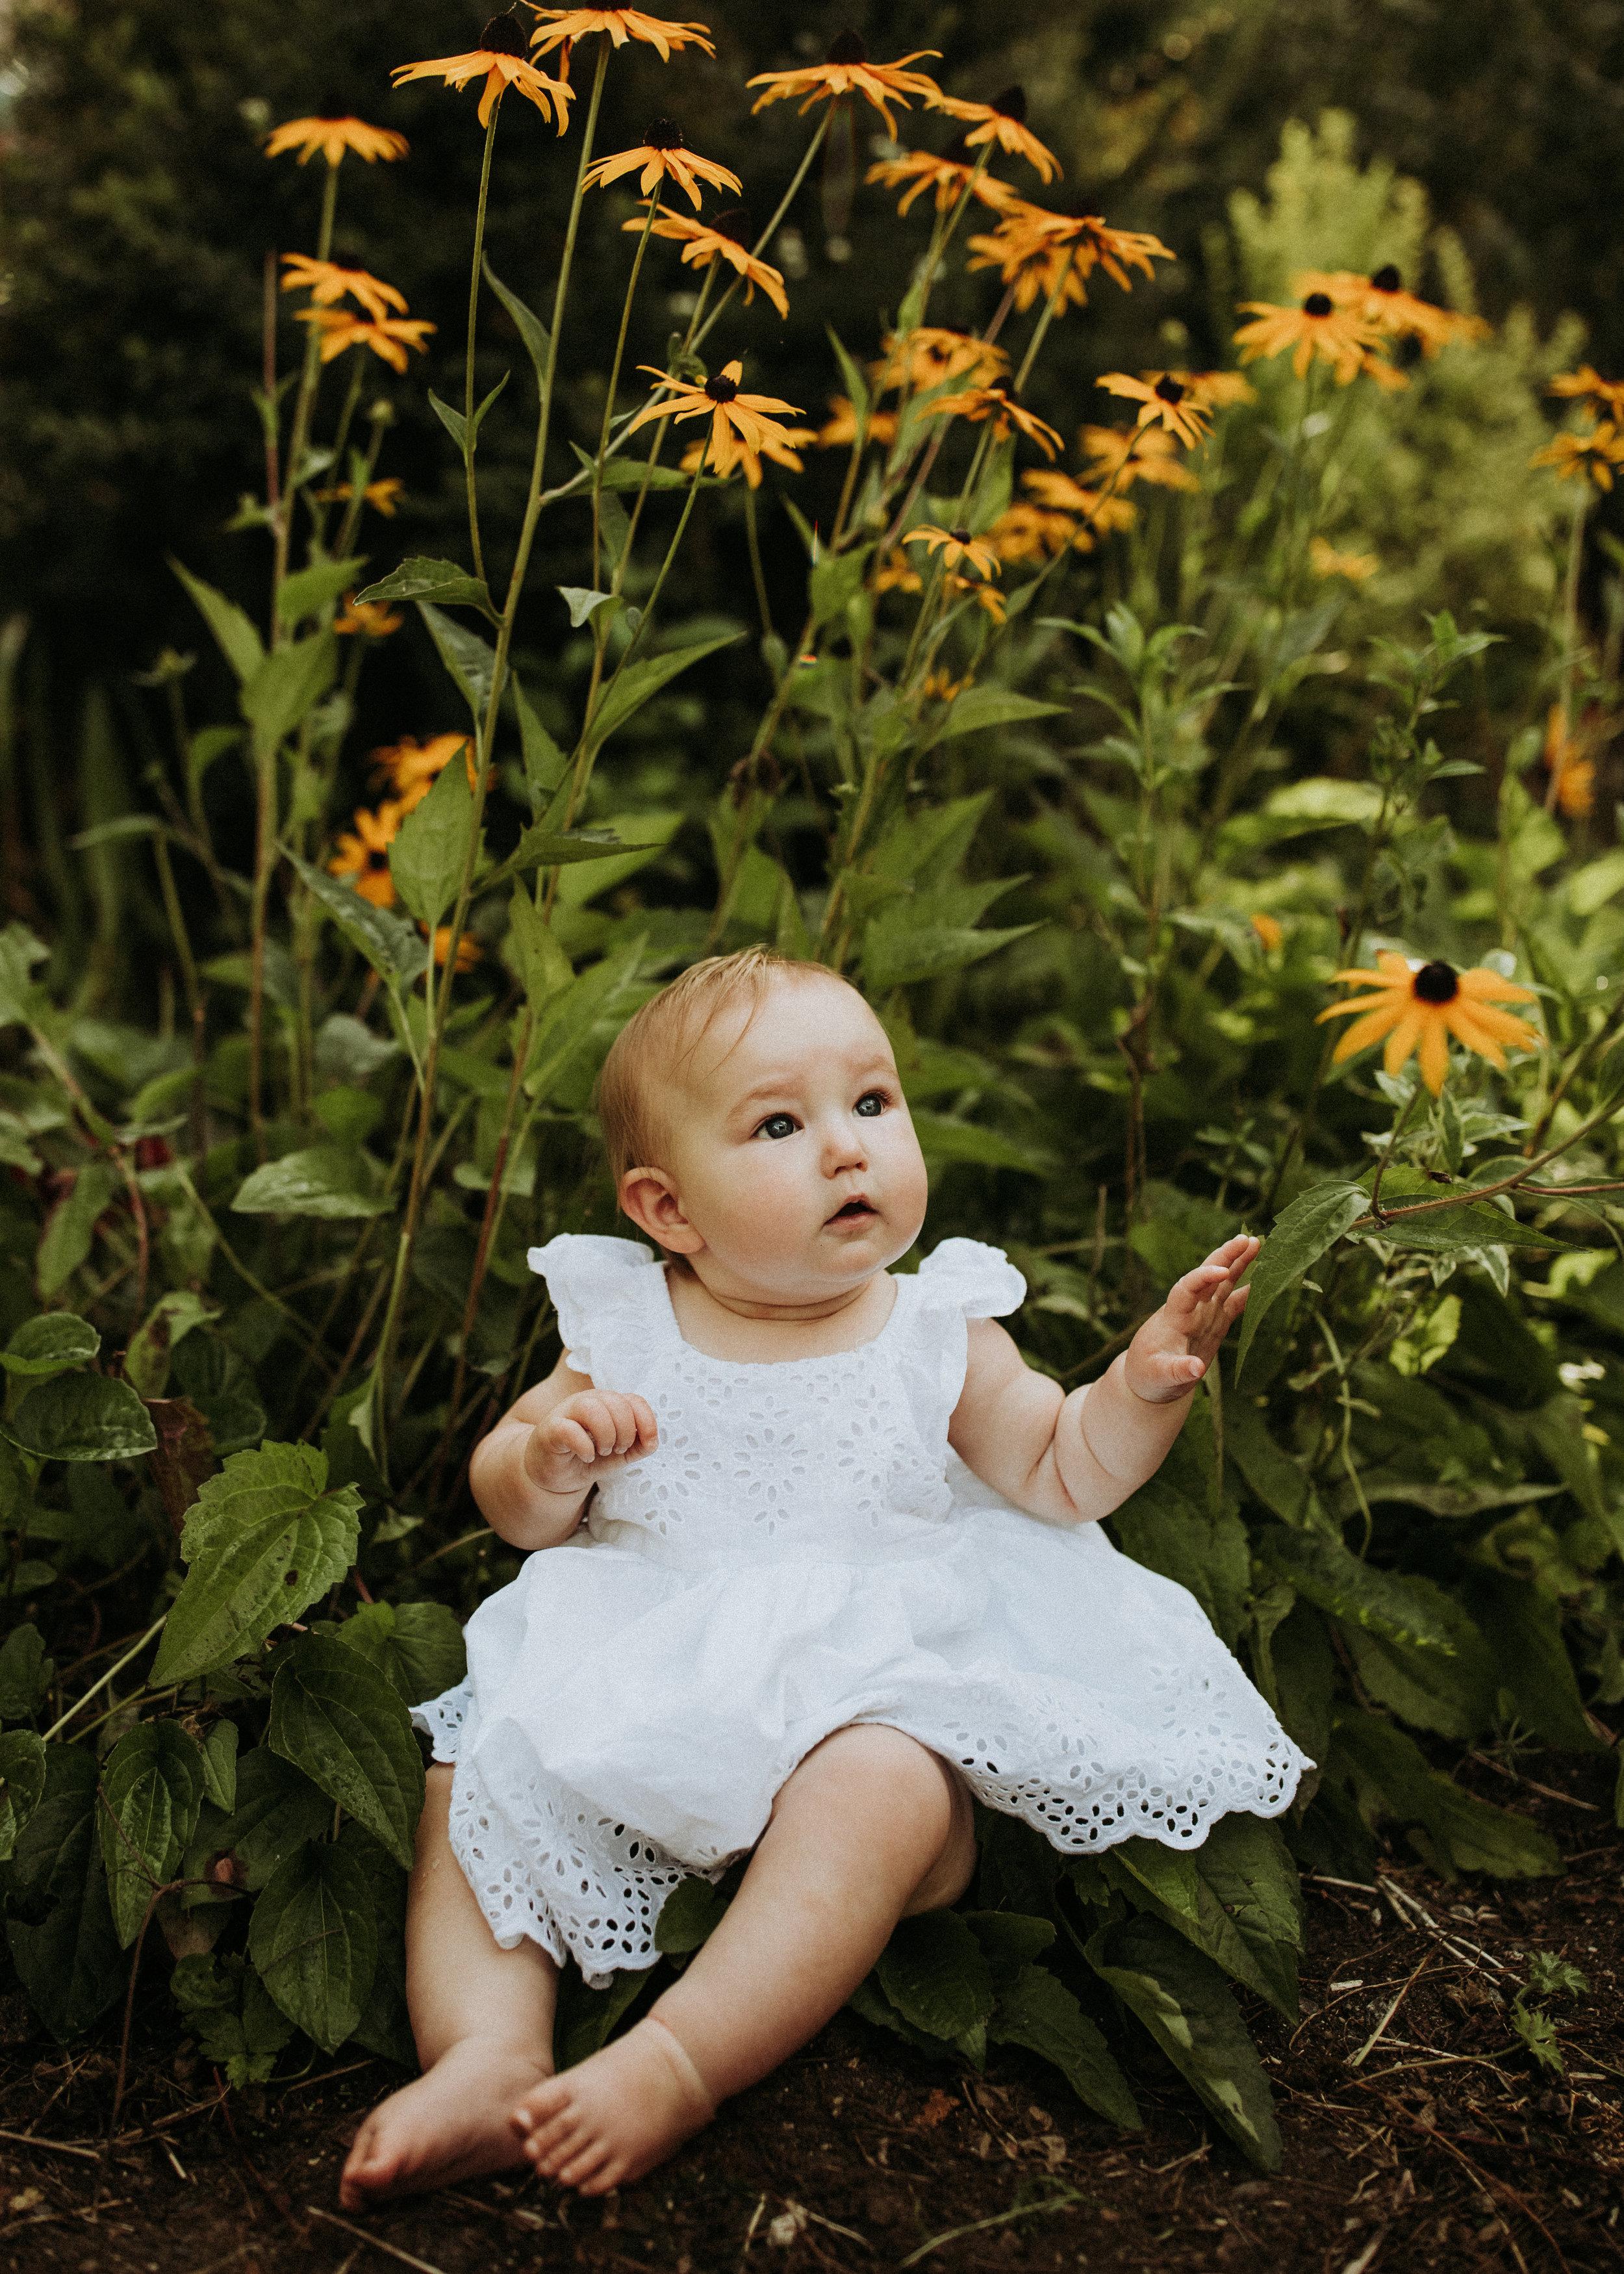 Family-Photographer-Bellingham-WA-Brianne-Bell-Photograpy-(Manske)-7.jpg